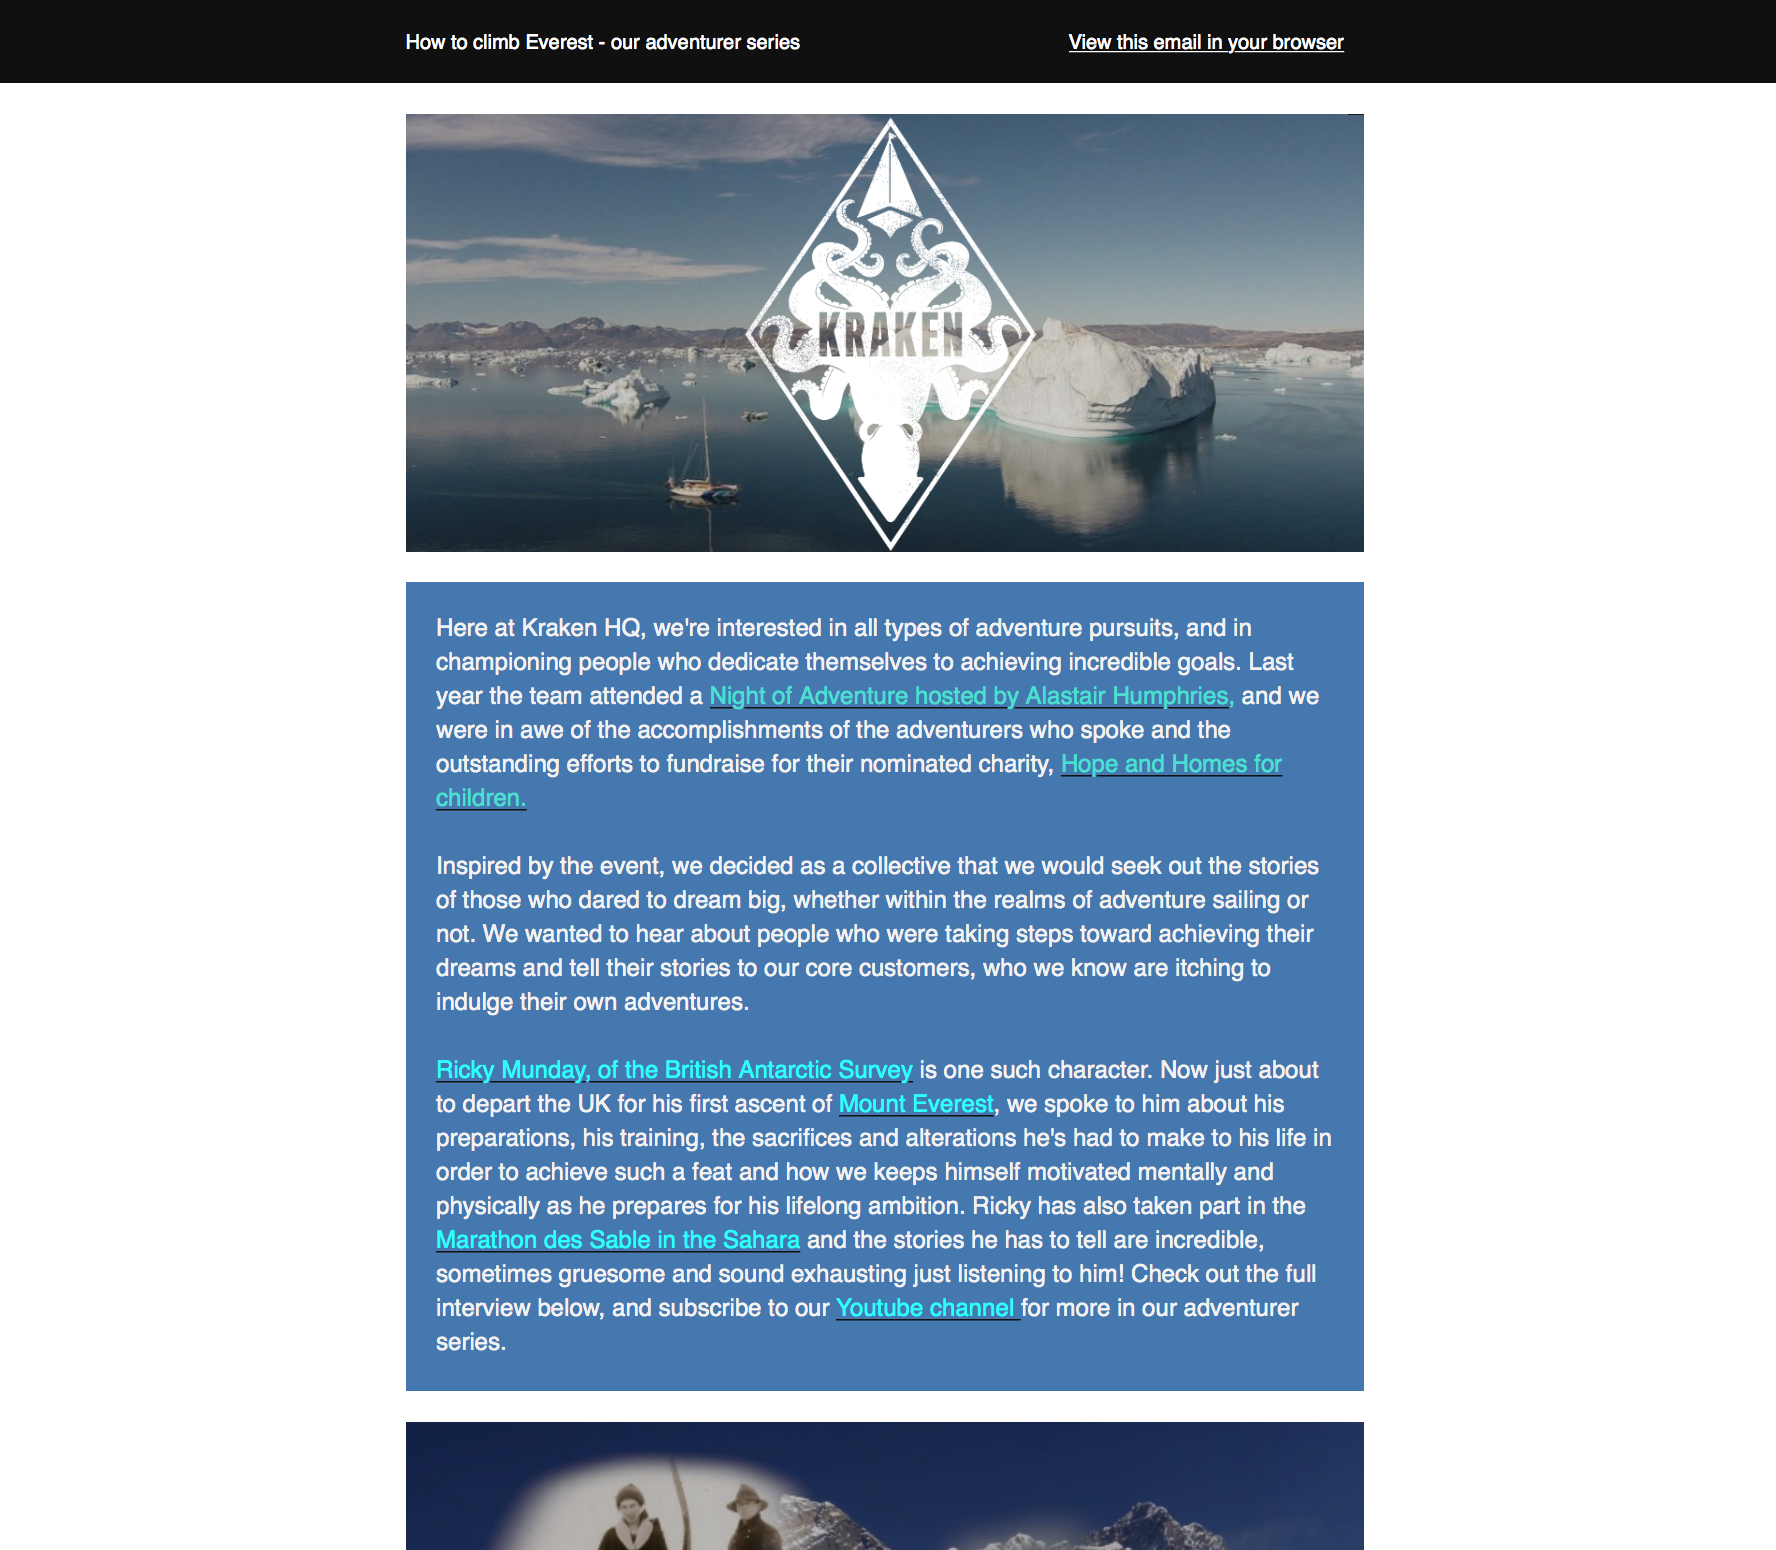 How to Climb Everest April 2017